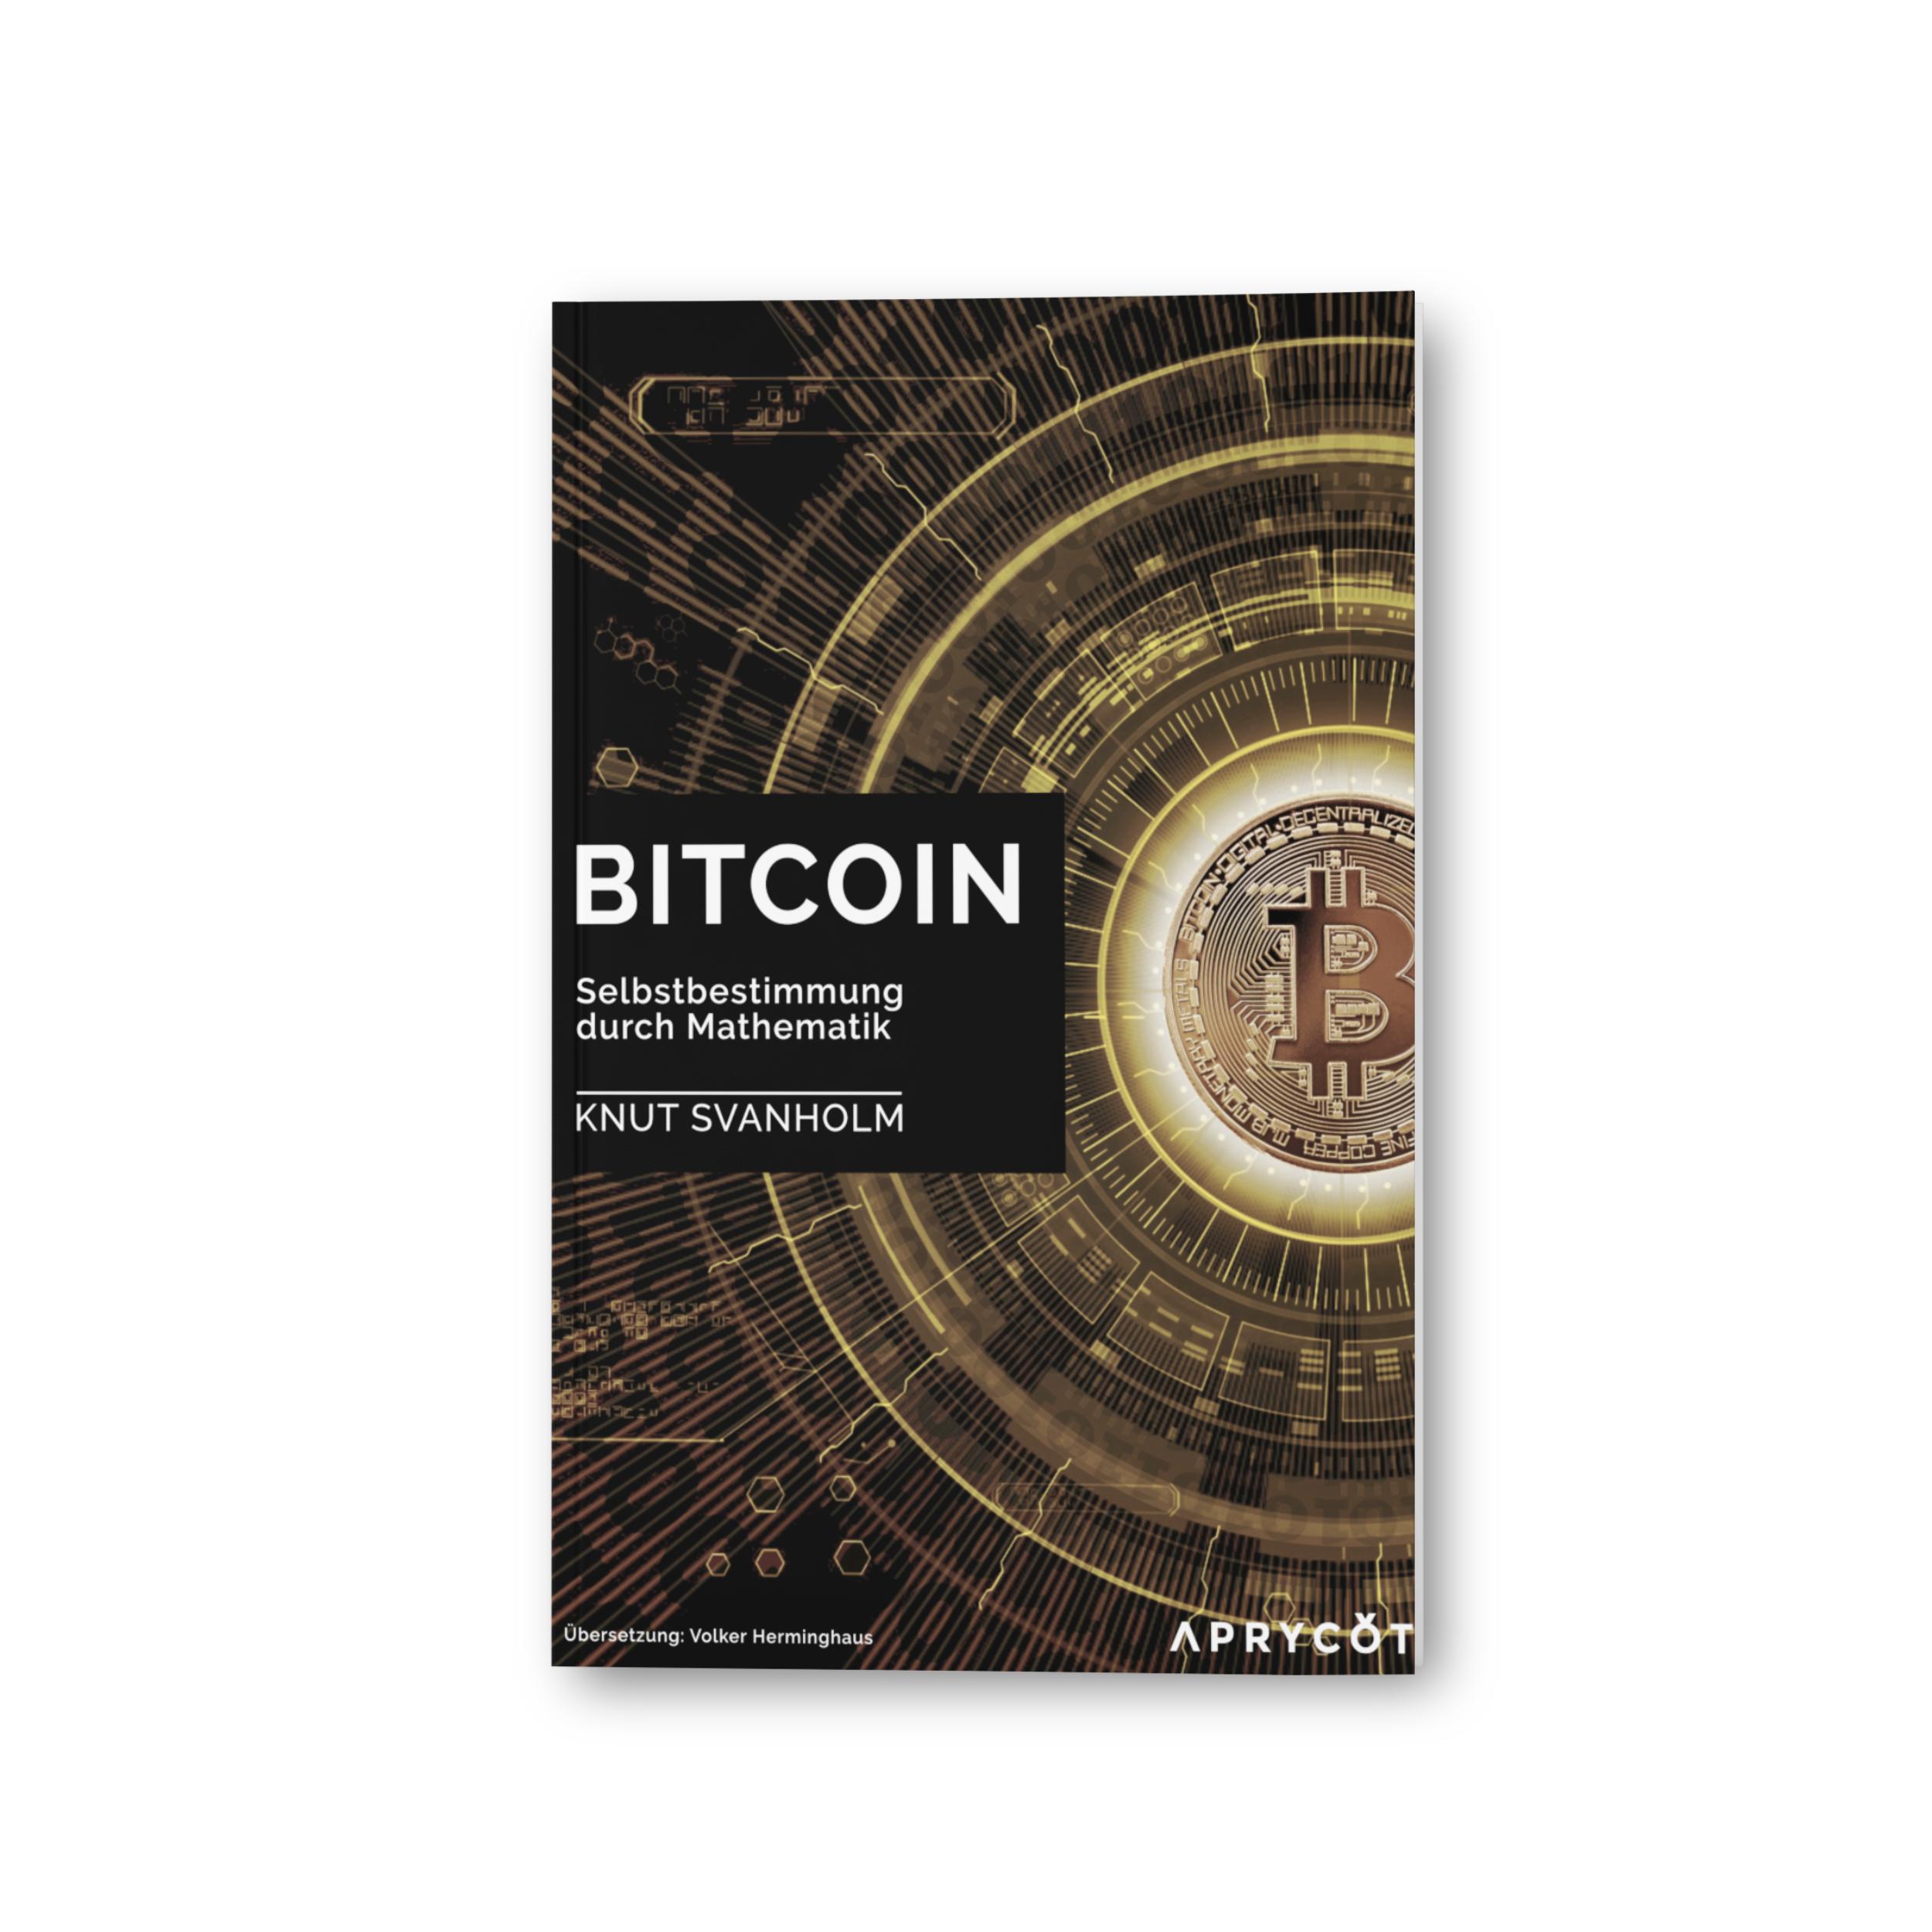 aprycot-media-bitcoin-selbstbestimmung-durch-mathemathik-01